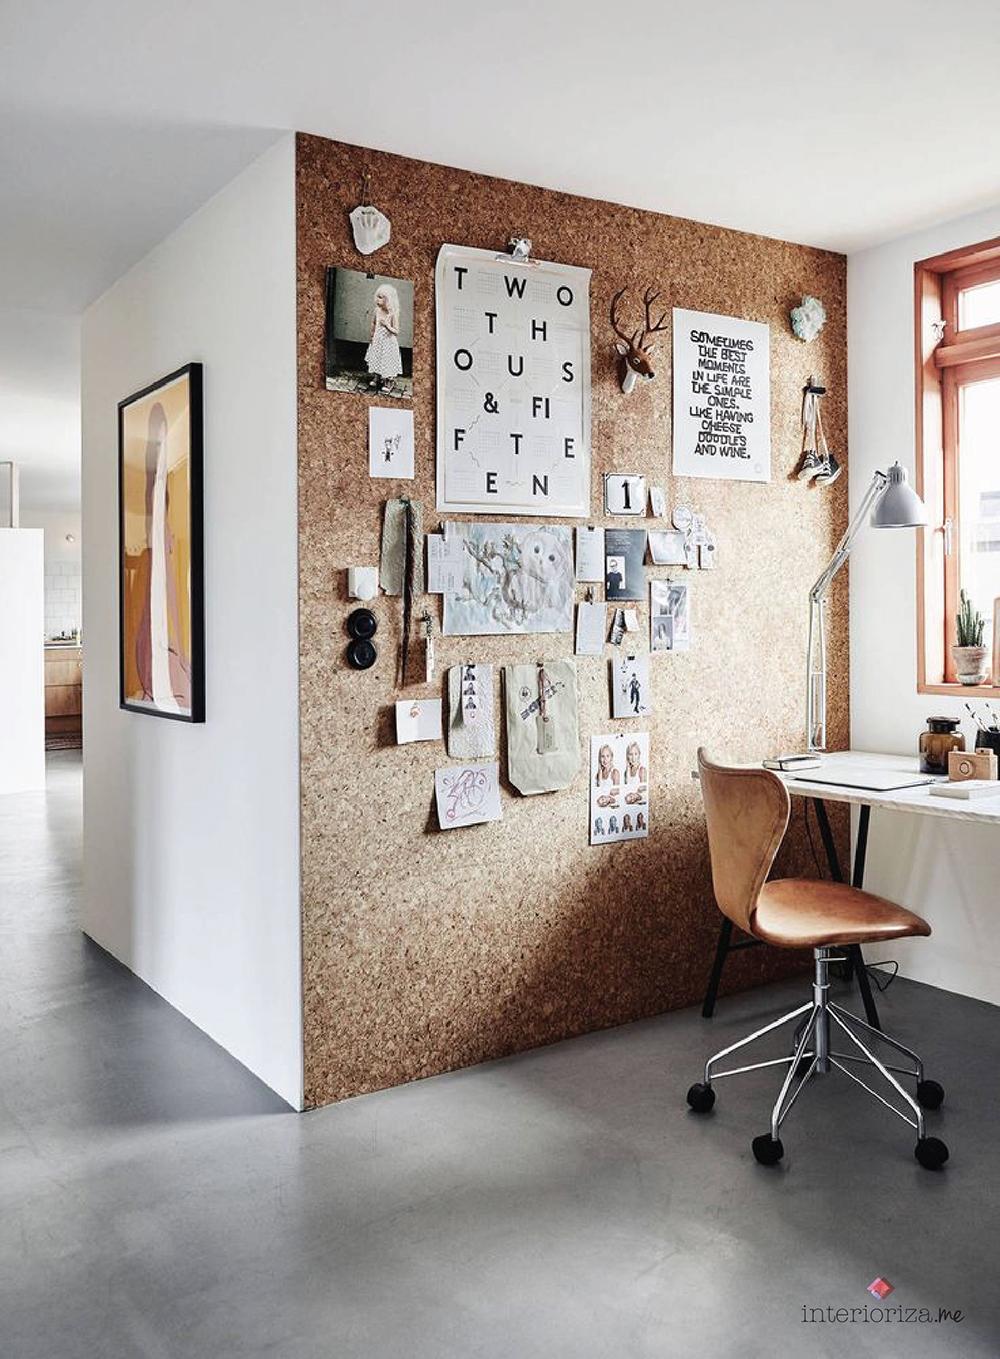 16-corkboard-visions-home office-design-homebnc